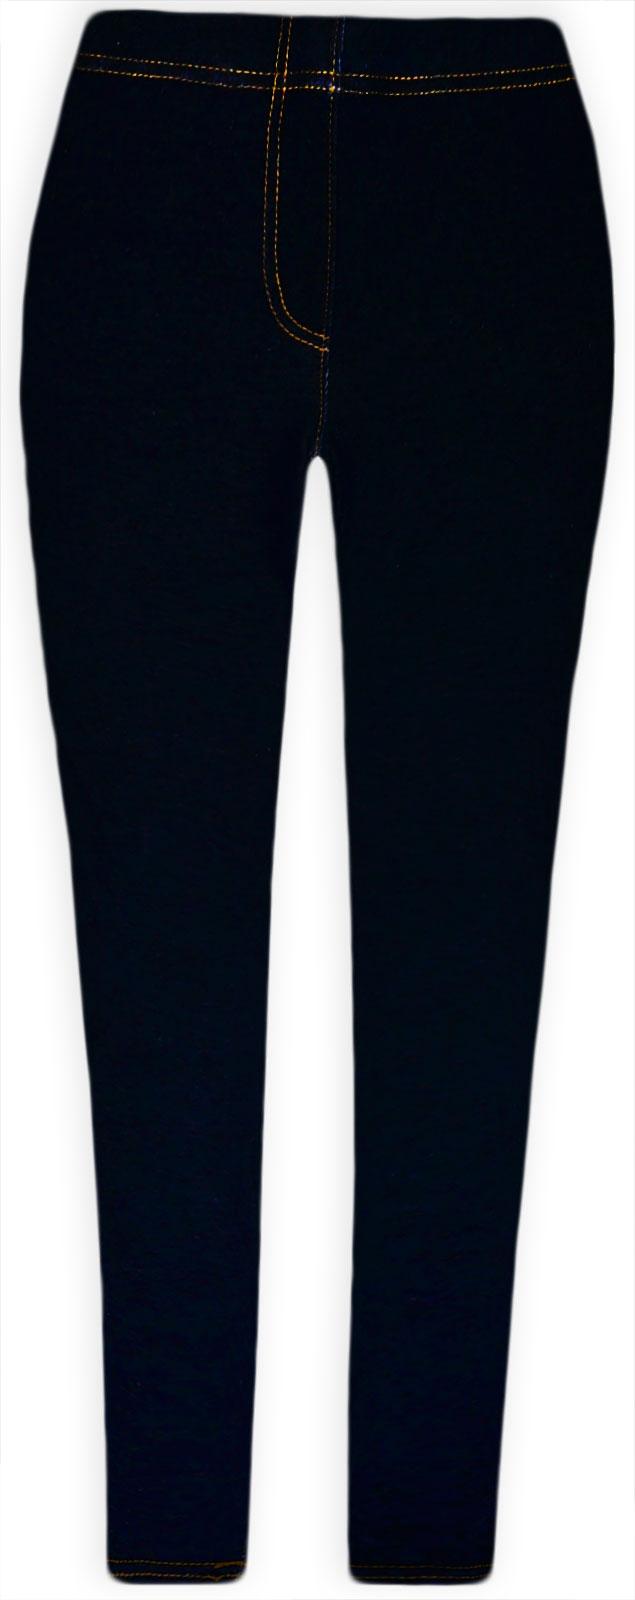 Ladies-Stretchy-Denim-Look-Skinny-Jeggings-Leggings-Women-Full-Length-Pants-6-28